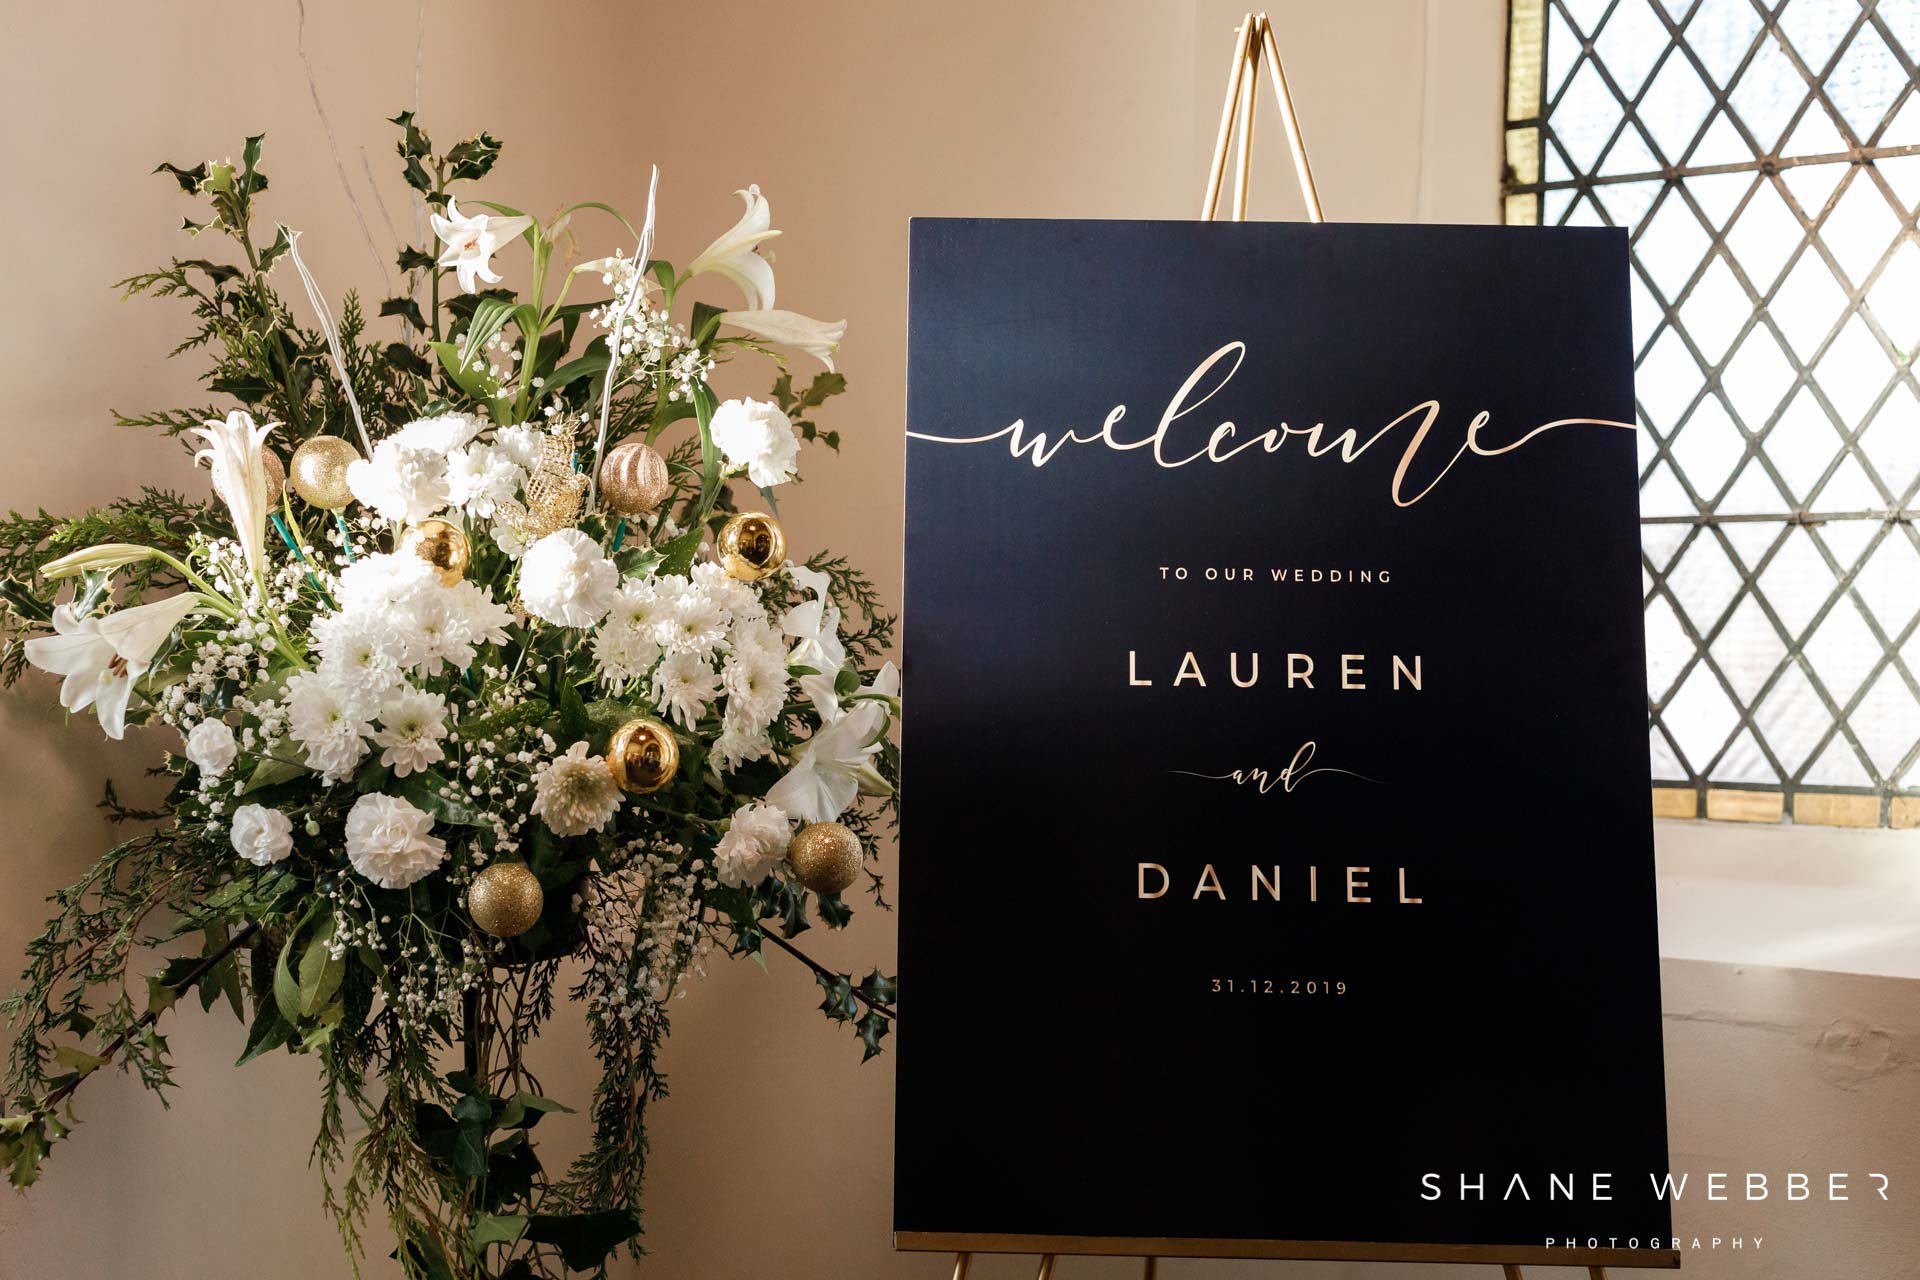 wedding ceremony welcome sign